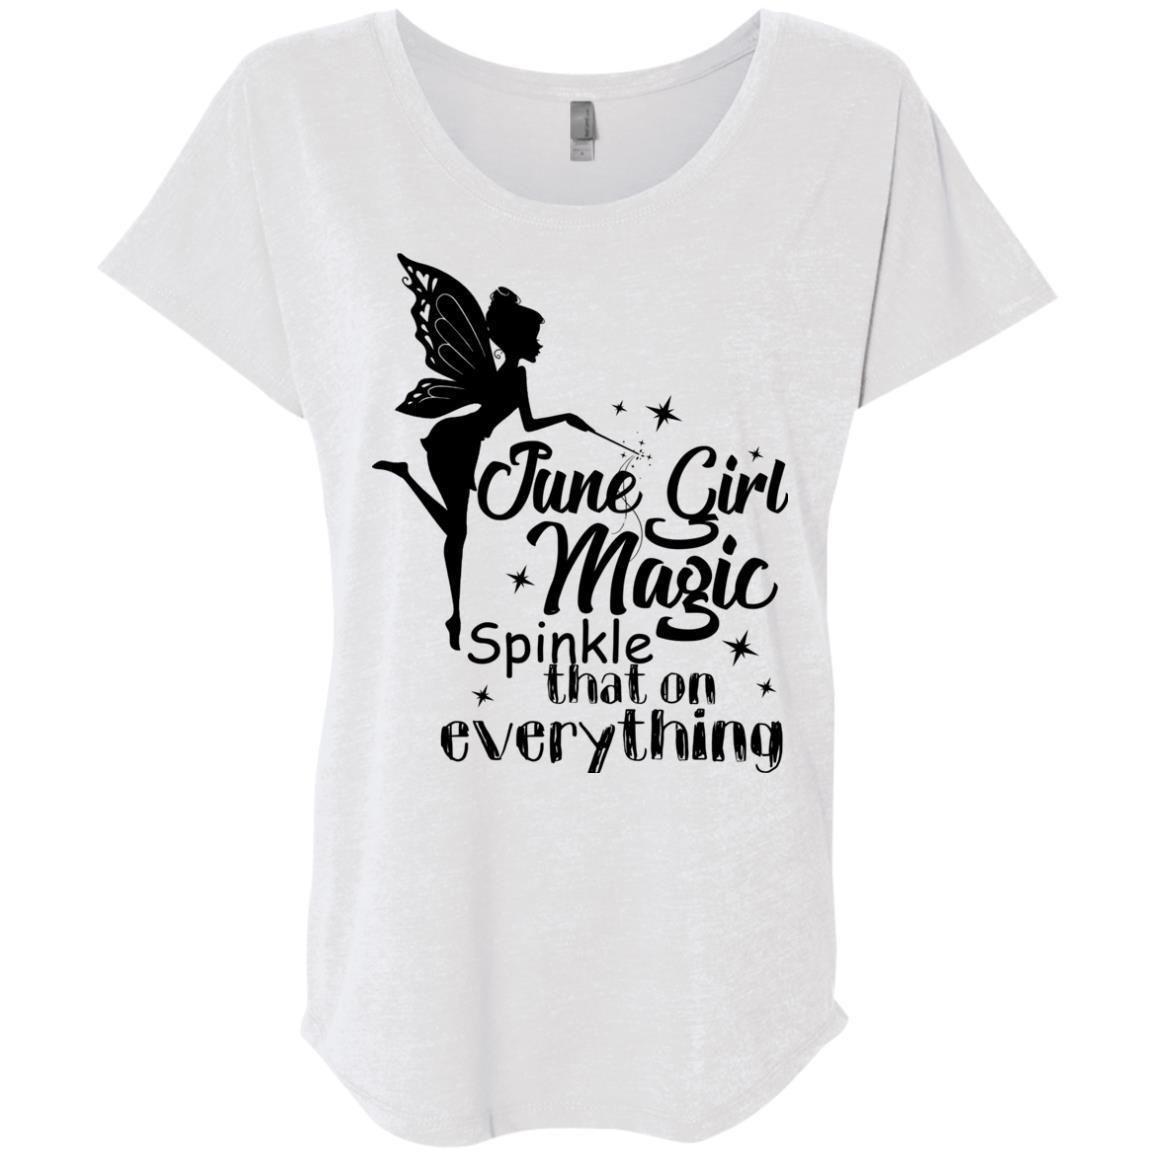 June Girl Magic I Sprinkle That On Everything Shirt